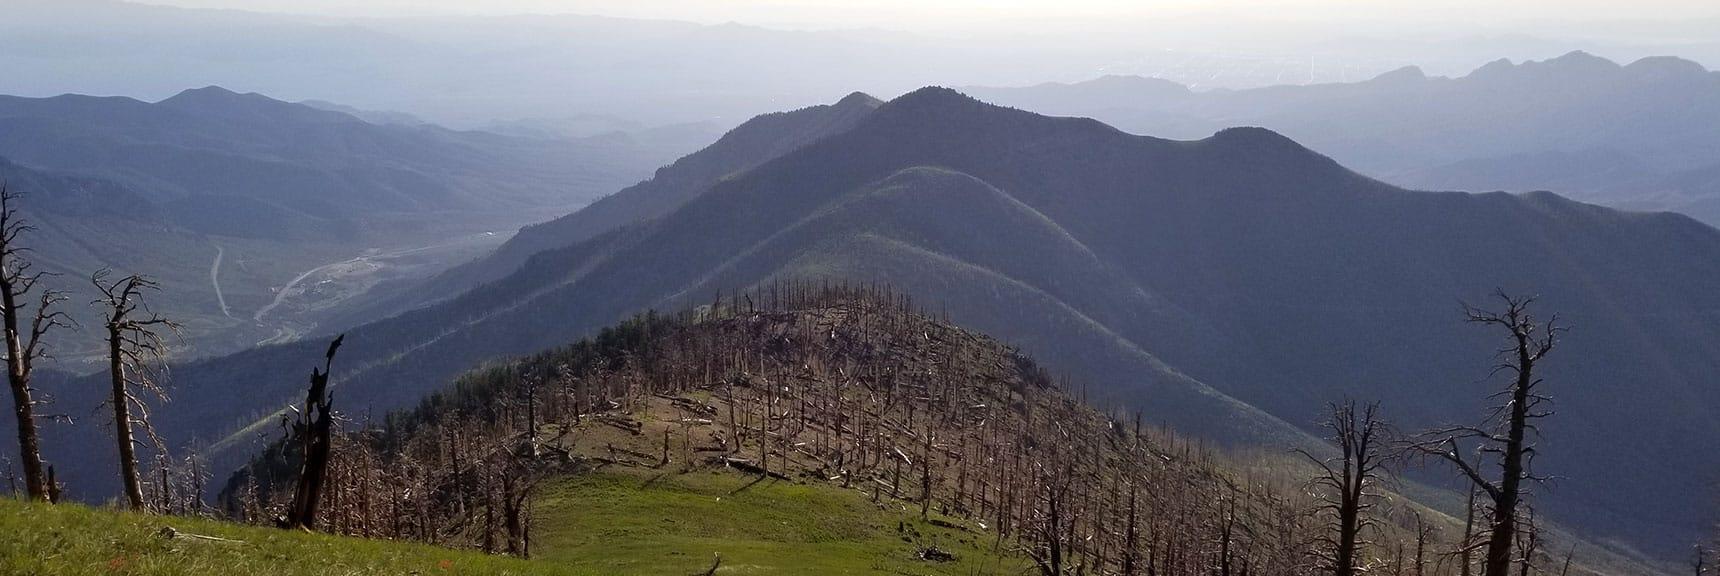 Heading Down Griffith Peak Toward Harris Peak